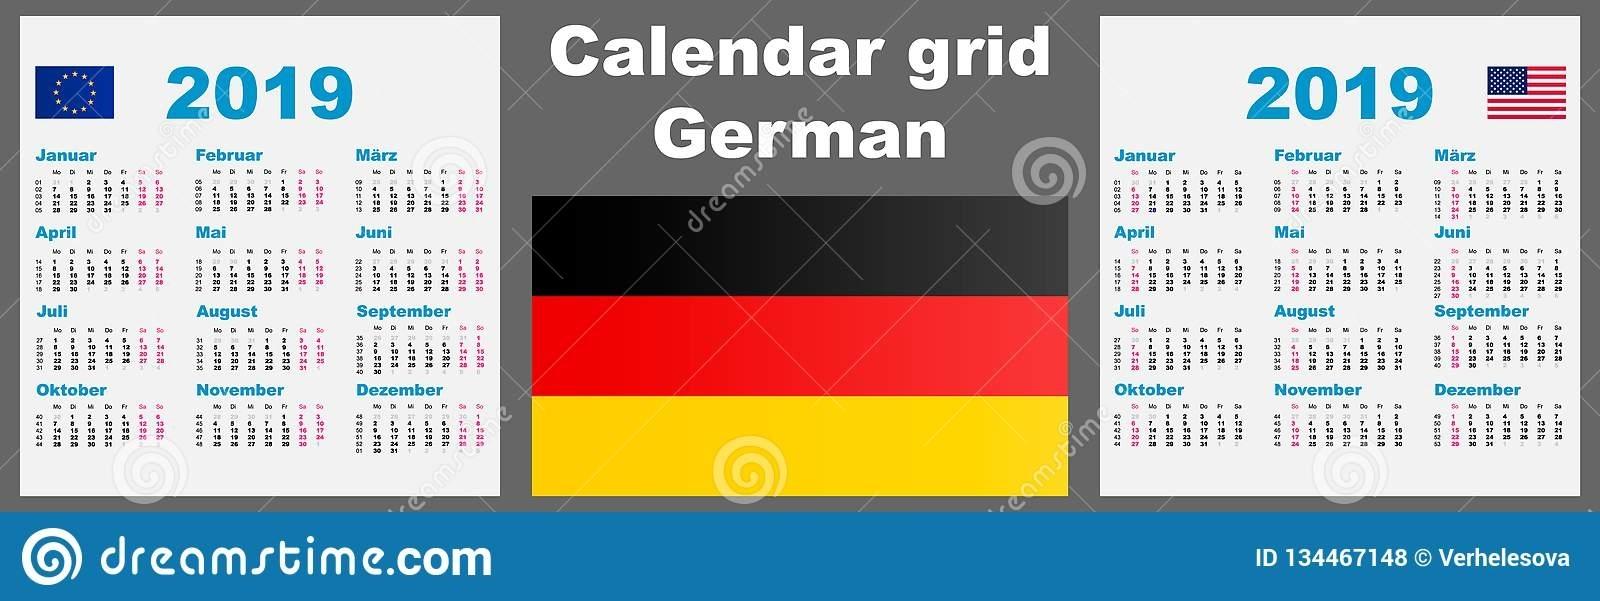 Calendar Deutsche, German 2019 Set Grid Wall Iso 8601